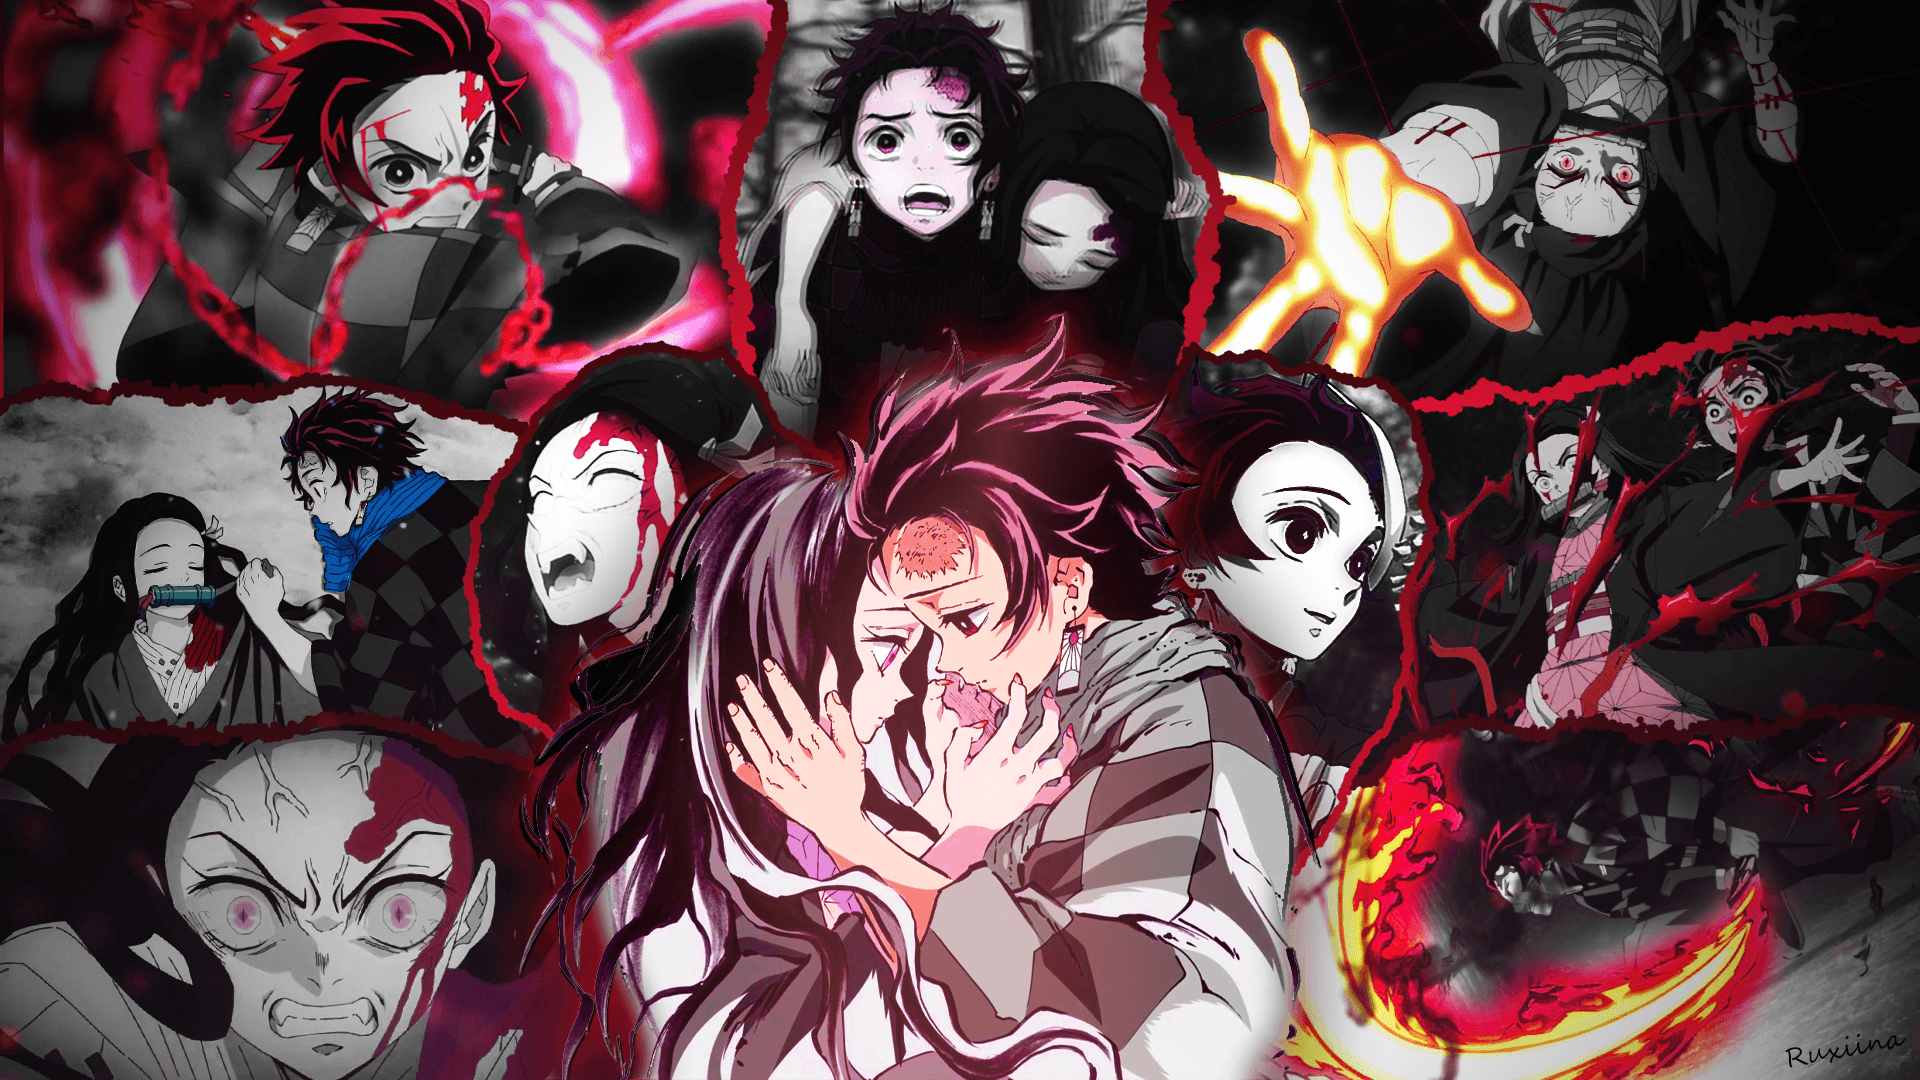 Demon Slayer Kimetsu No Yaiba UHD Wallpapers - Wallpaper Cave